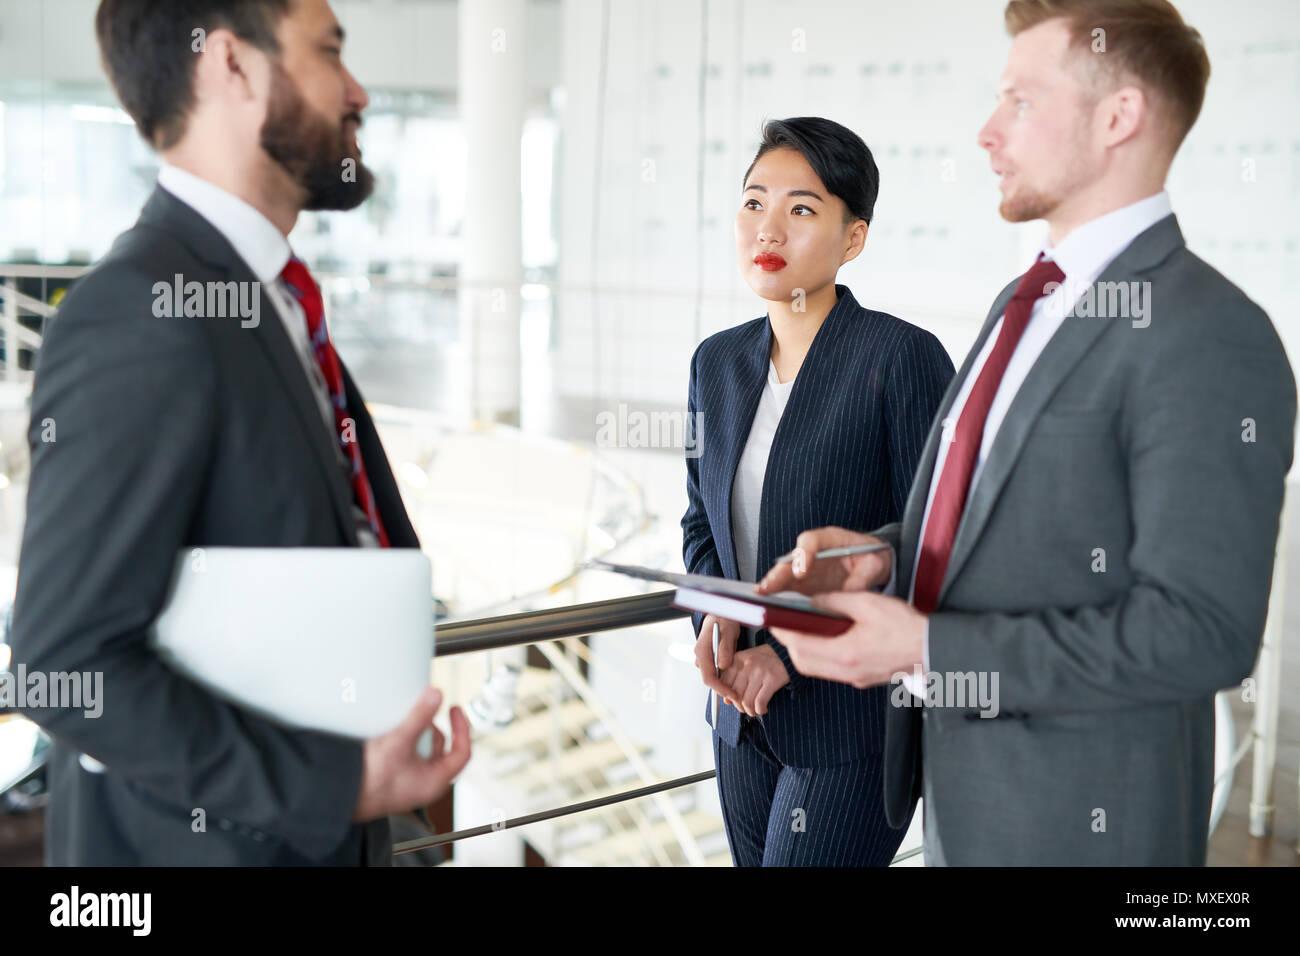 Colleagues Having Informal Working Meeting - Stock Image